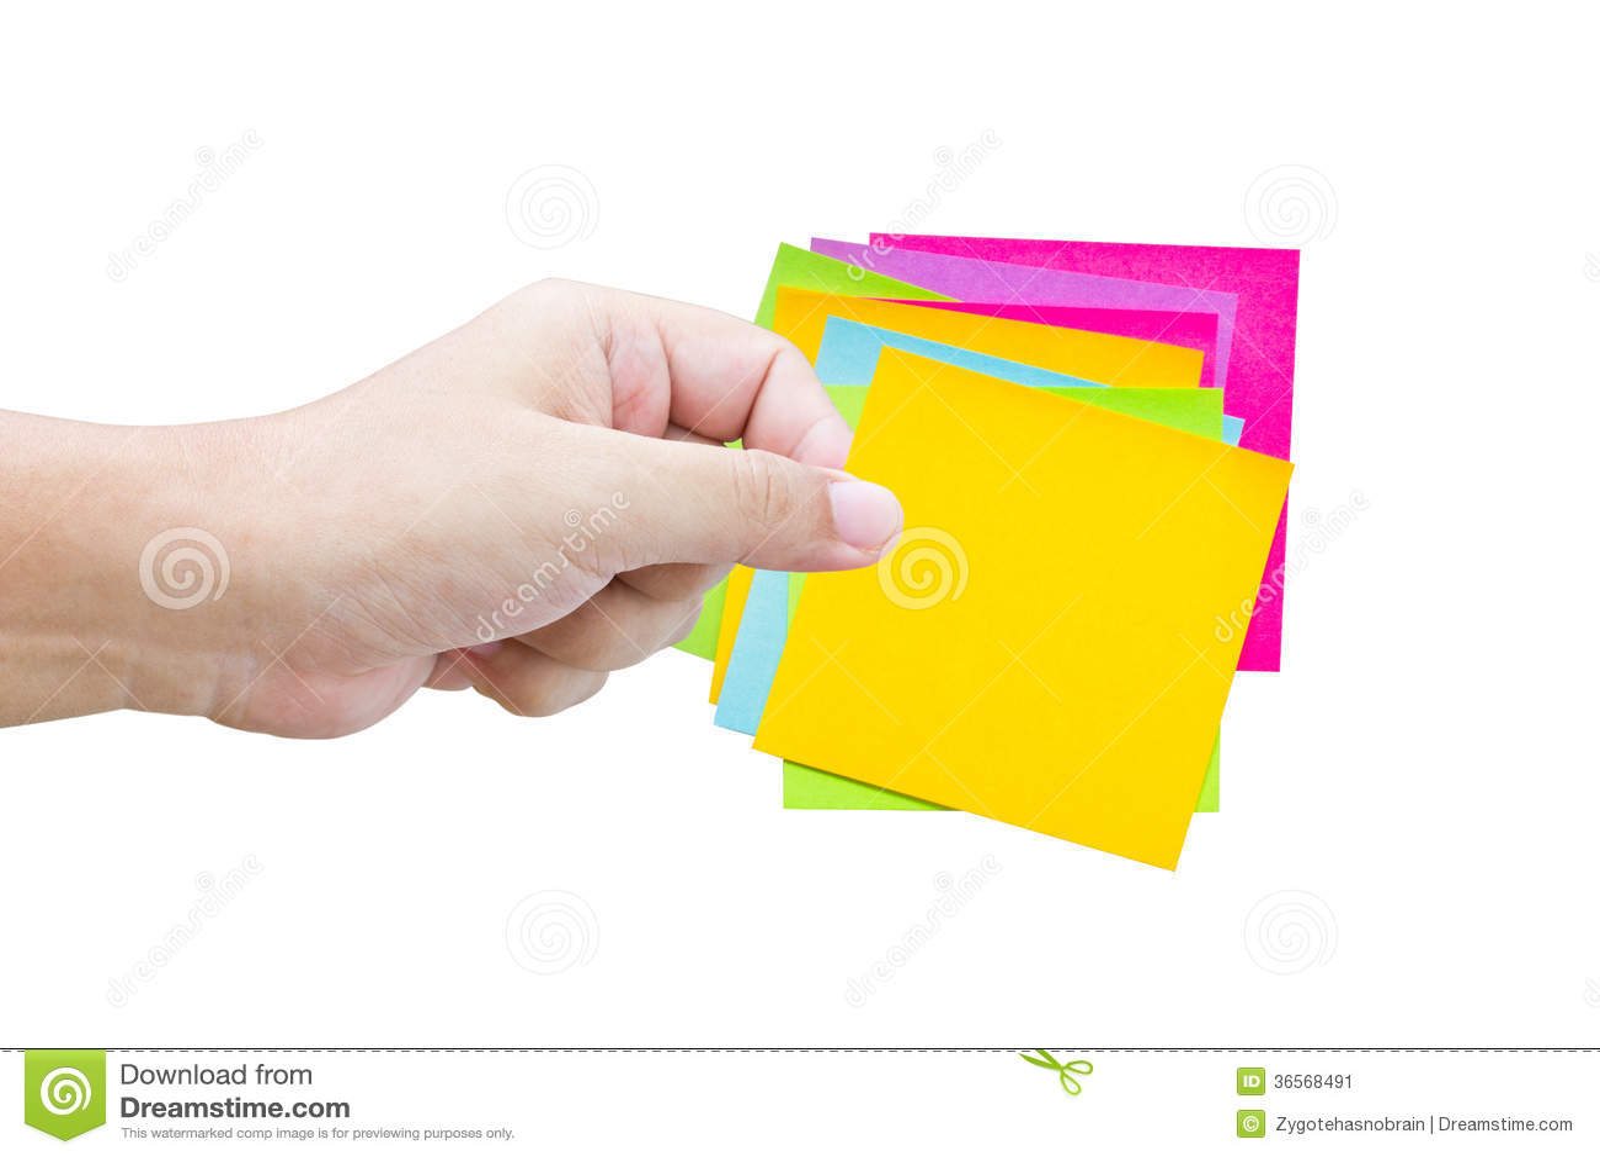 Sticky stylish notes download